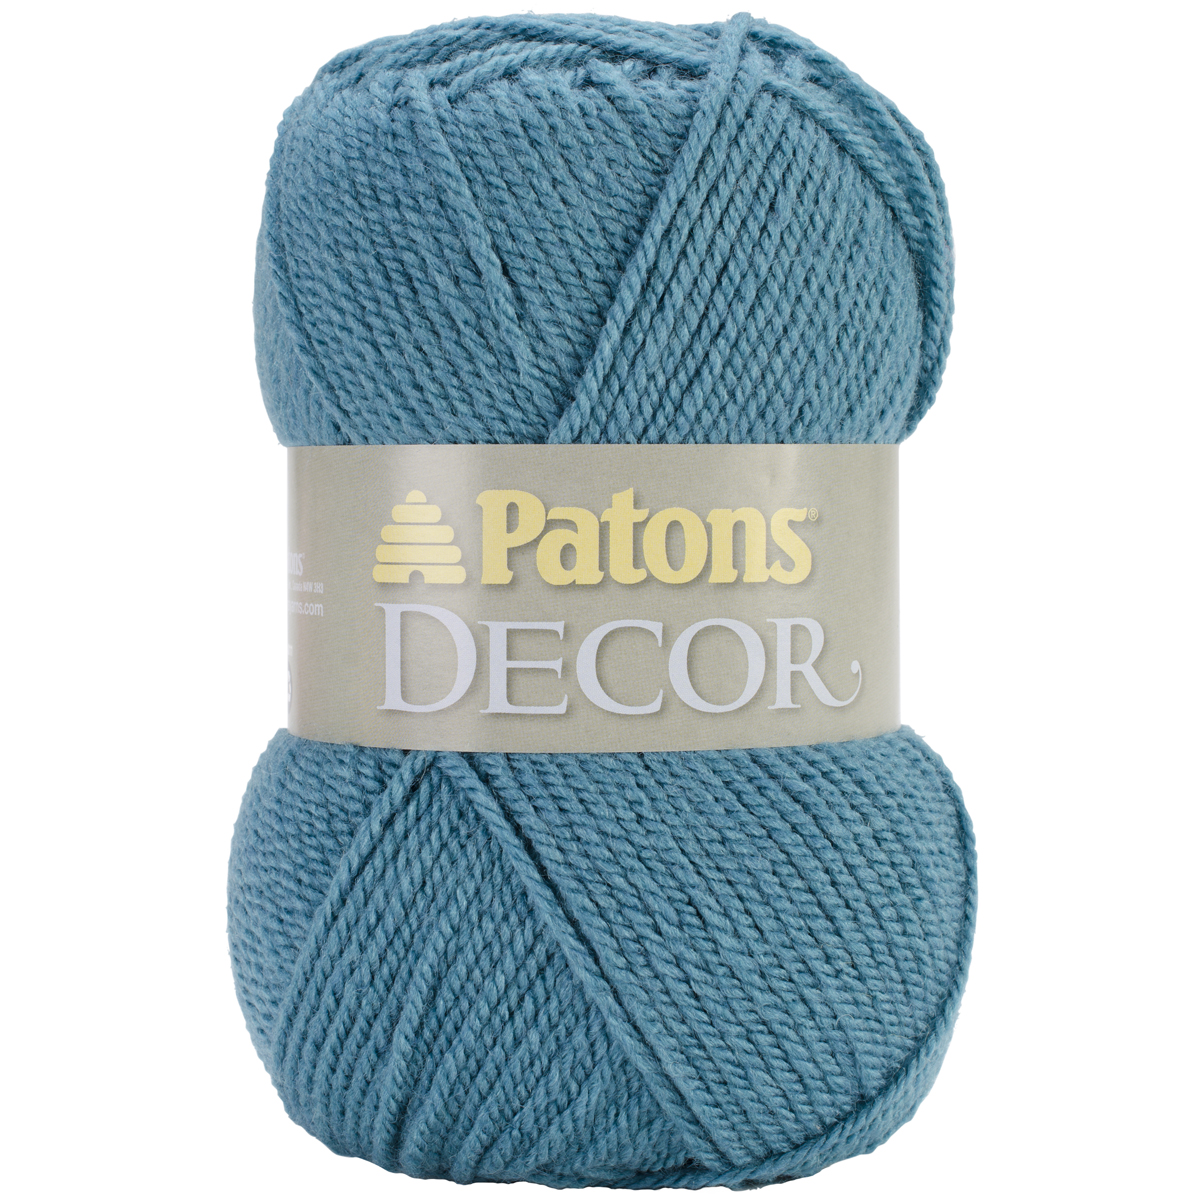 Patons Decor Yarn - 20 plus COLORS